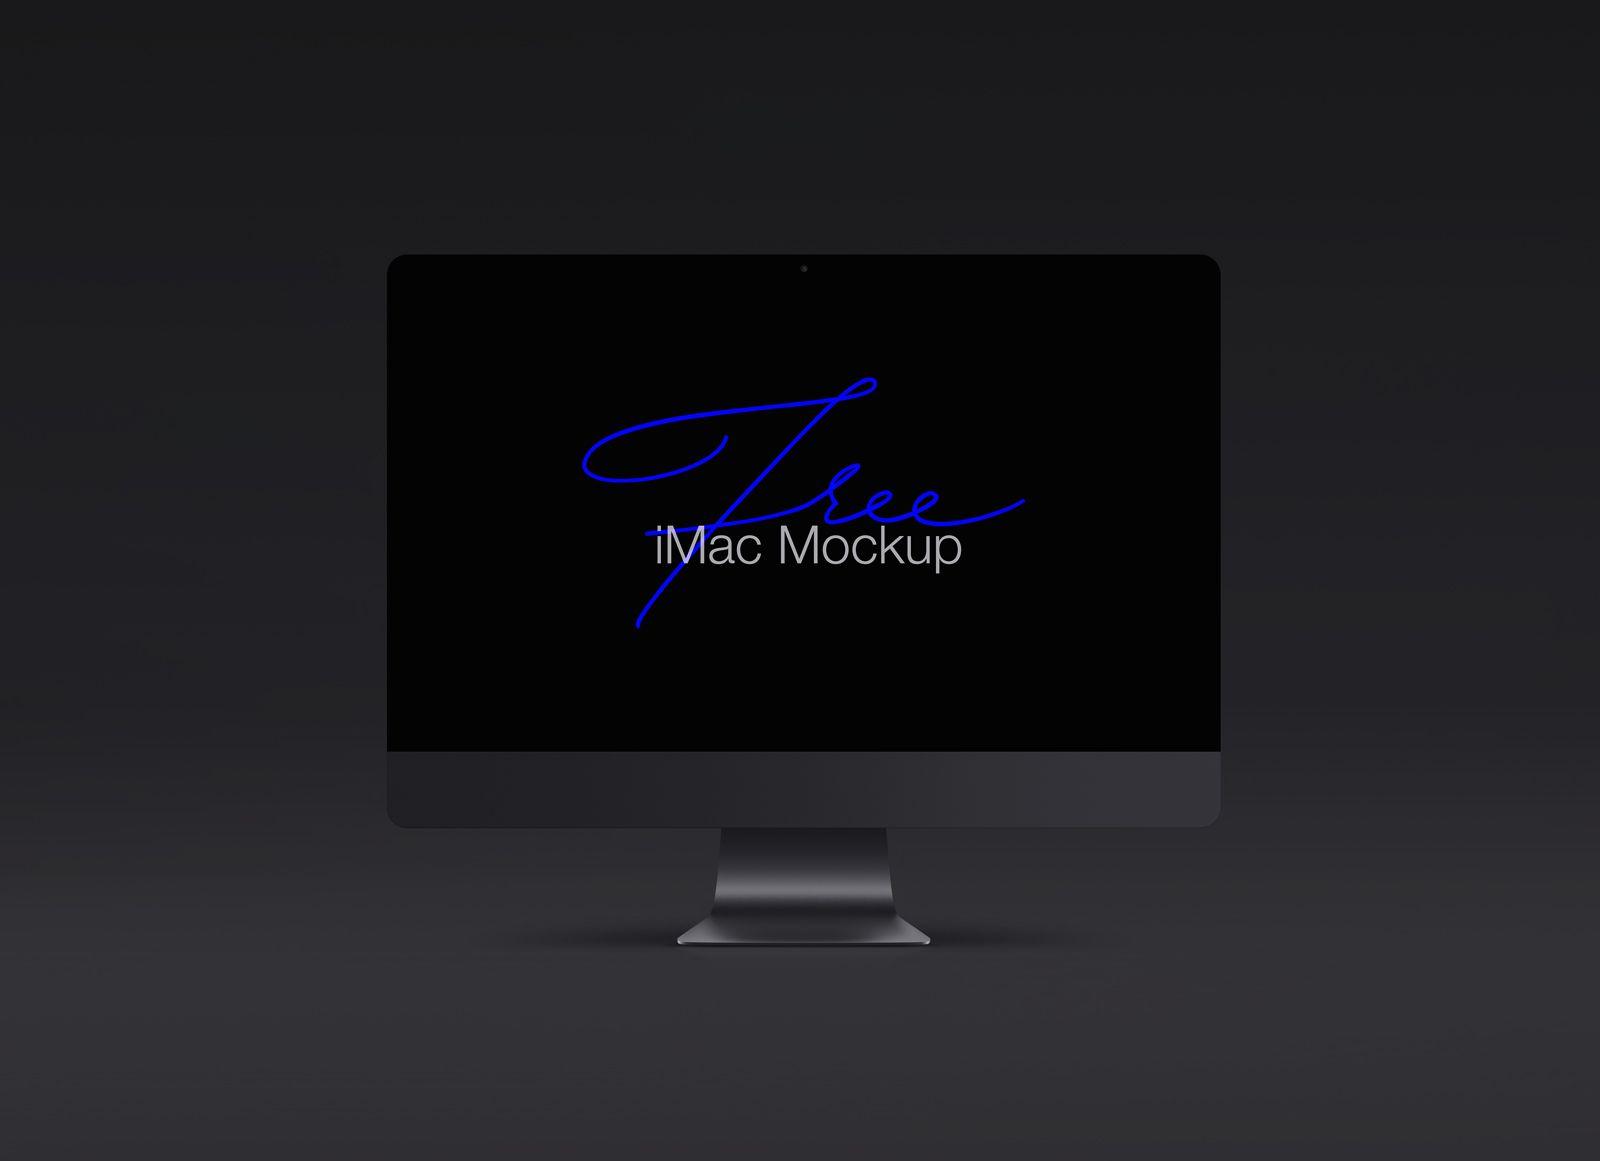 Free Black Apple Imac Pro Mockup Psd Template Imac Black Apple Ipad Pro Apple Pencil